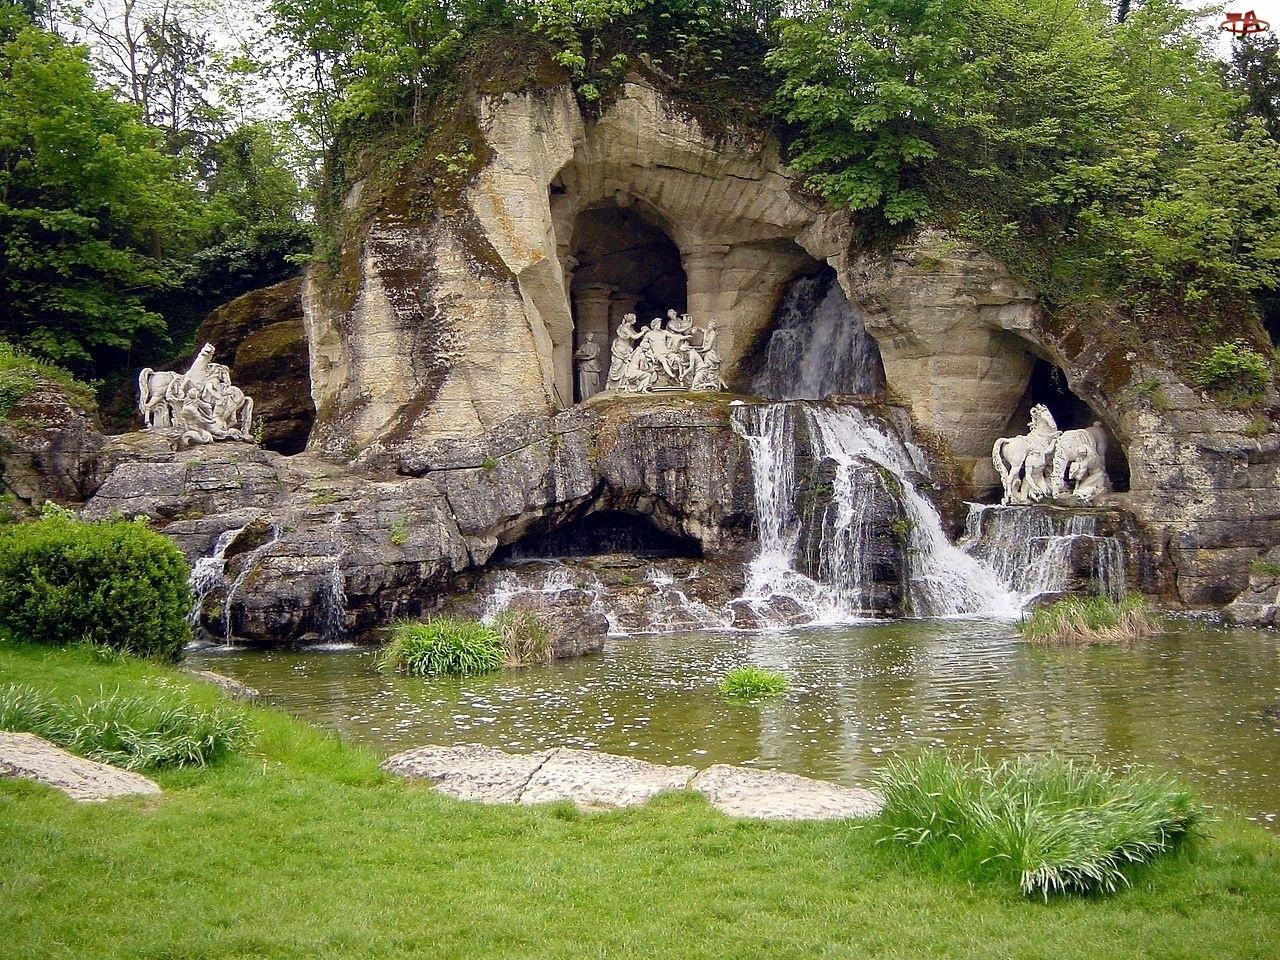 Francja, Ogród, Fontanna